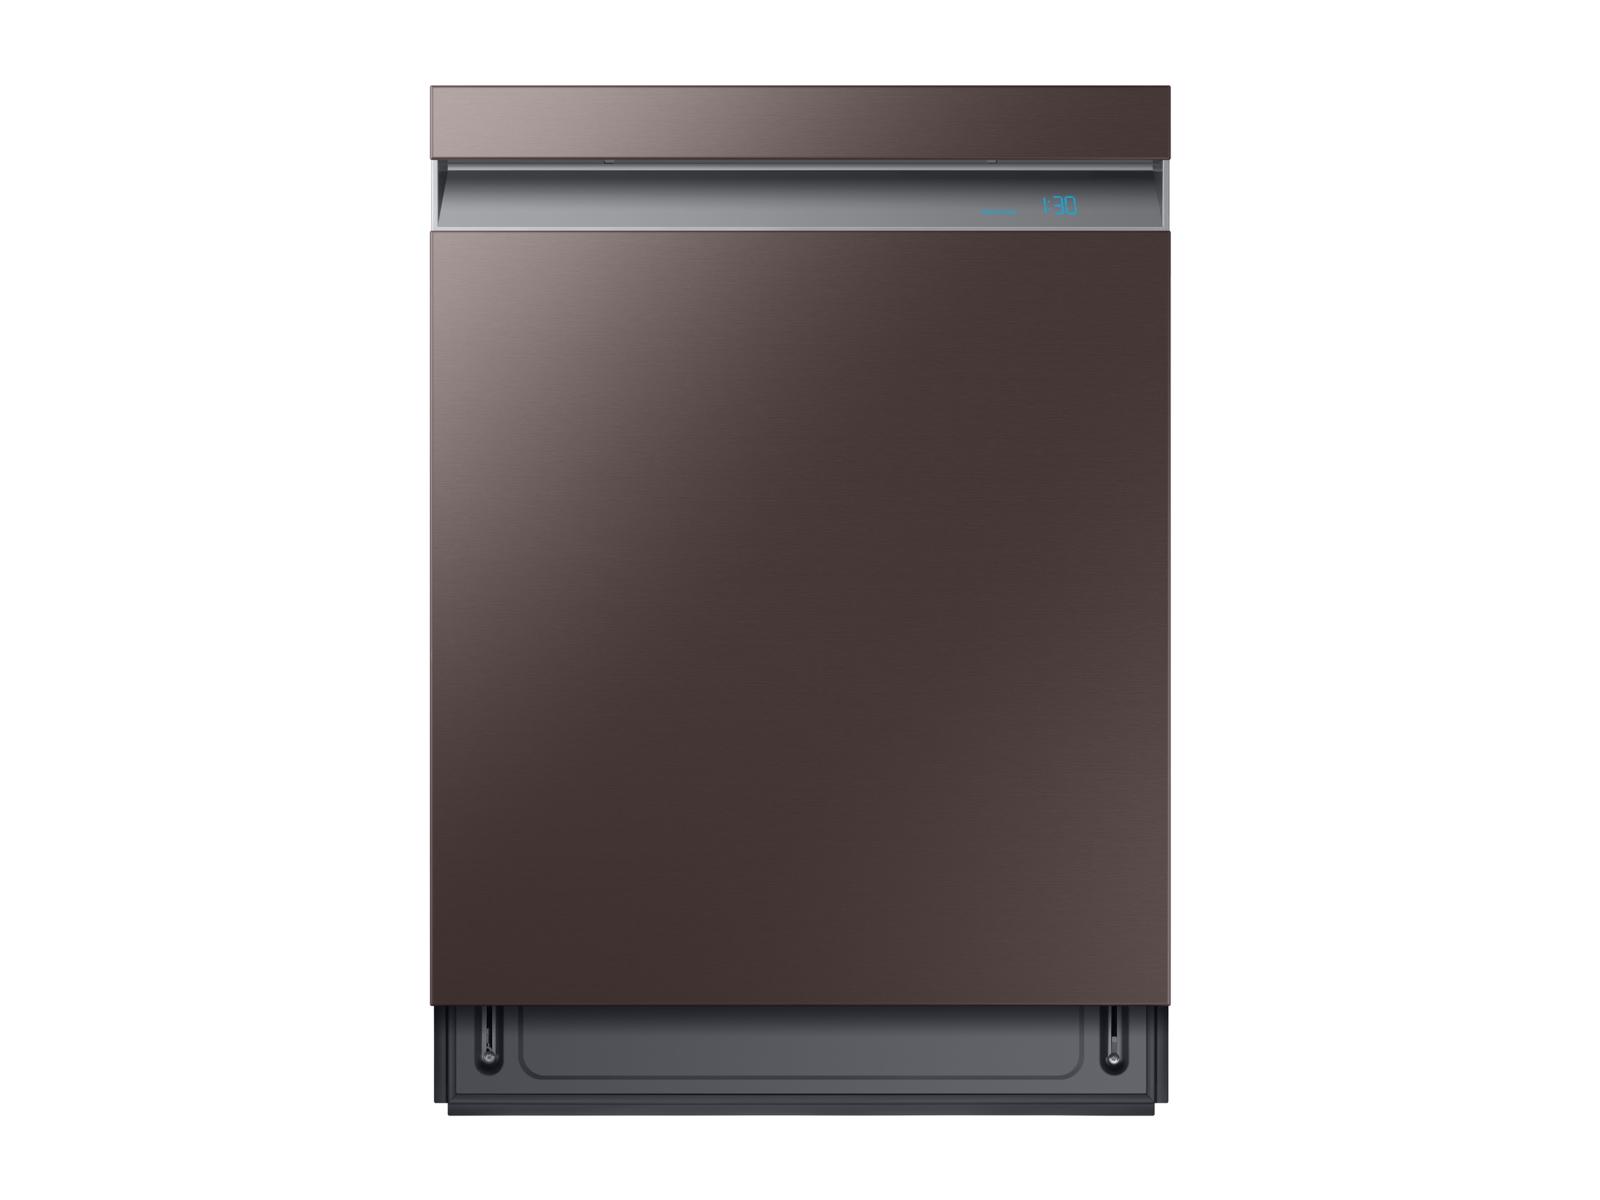 22 cu. ft. counter depth 4-door Family HubTM refrigerator, 6.3 cu. ft. electric range, 2.1 cu. ft. microwave and Smart Linear dishwasher package